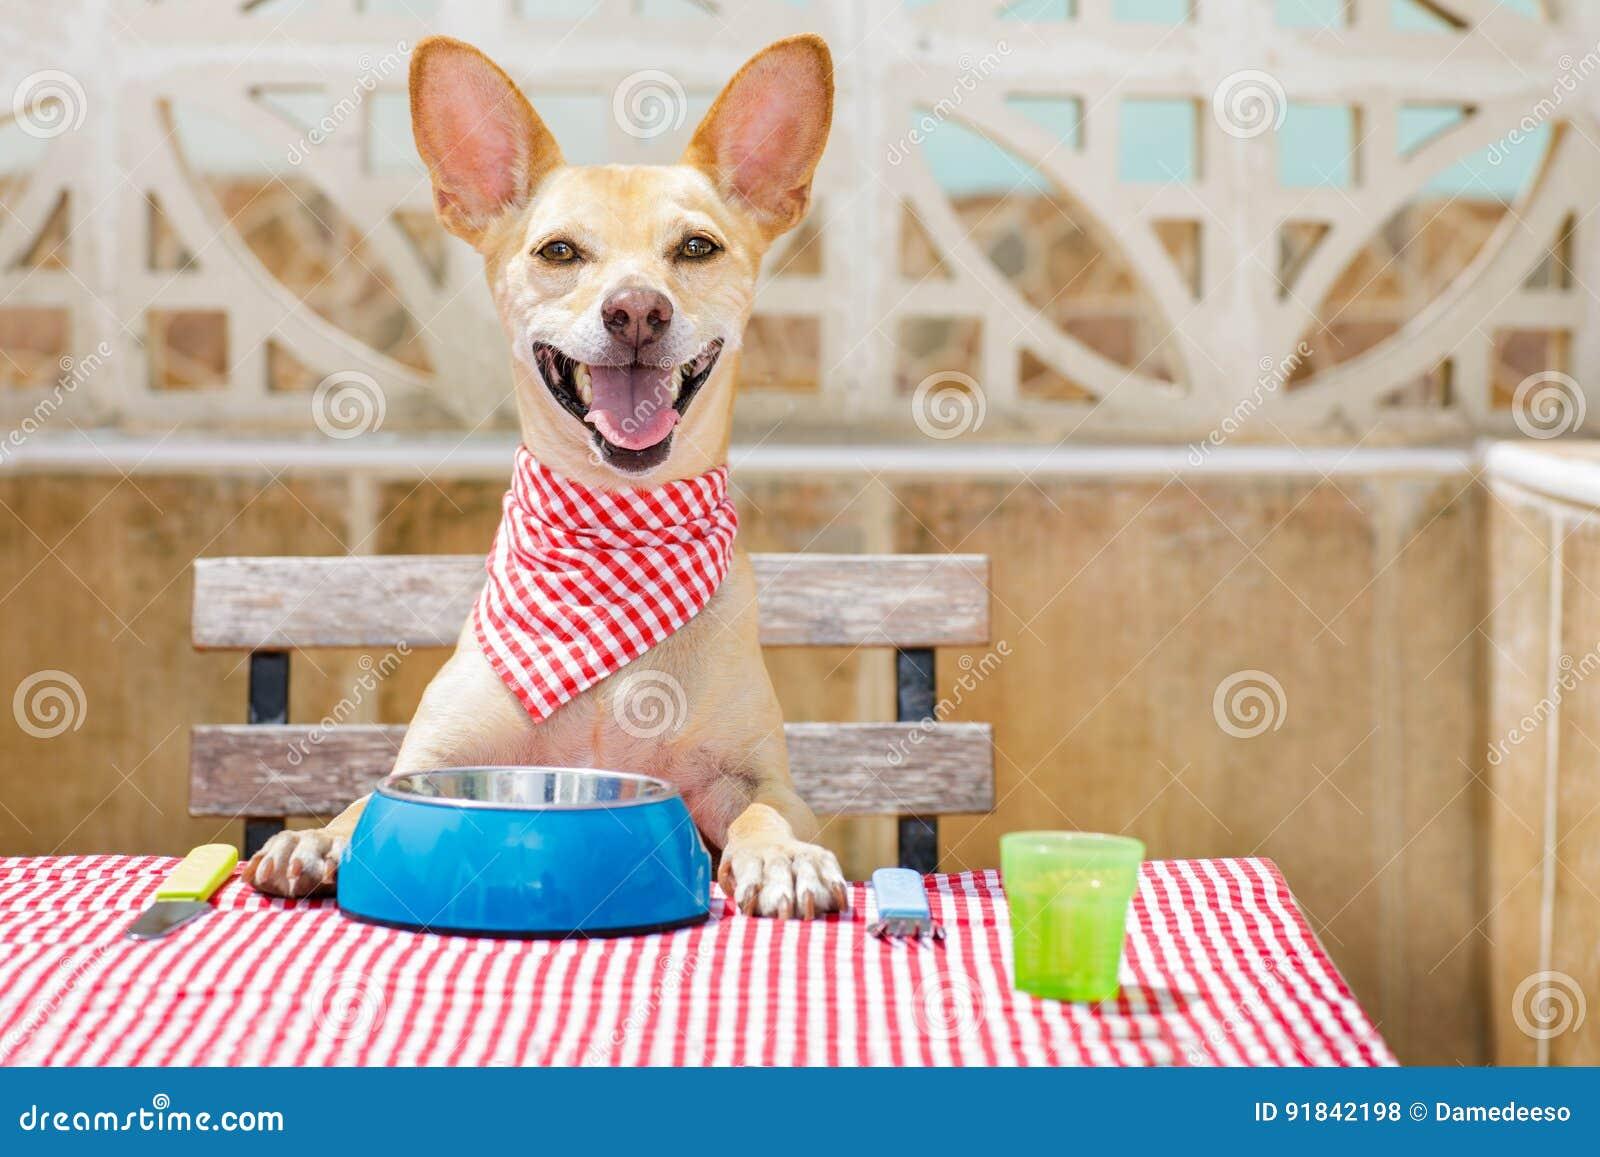 Dog Guarding Food Not Eating